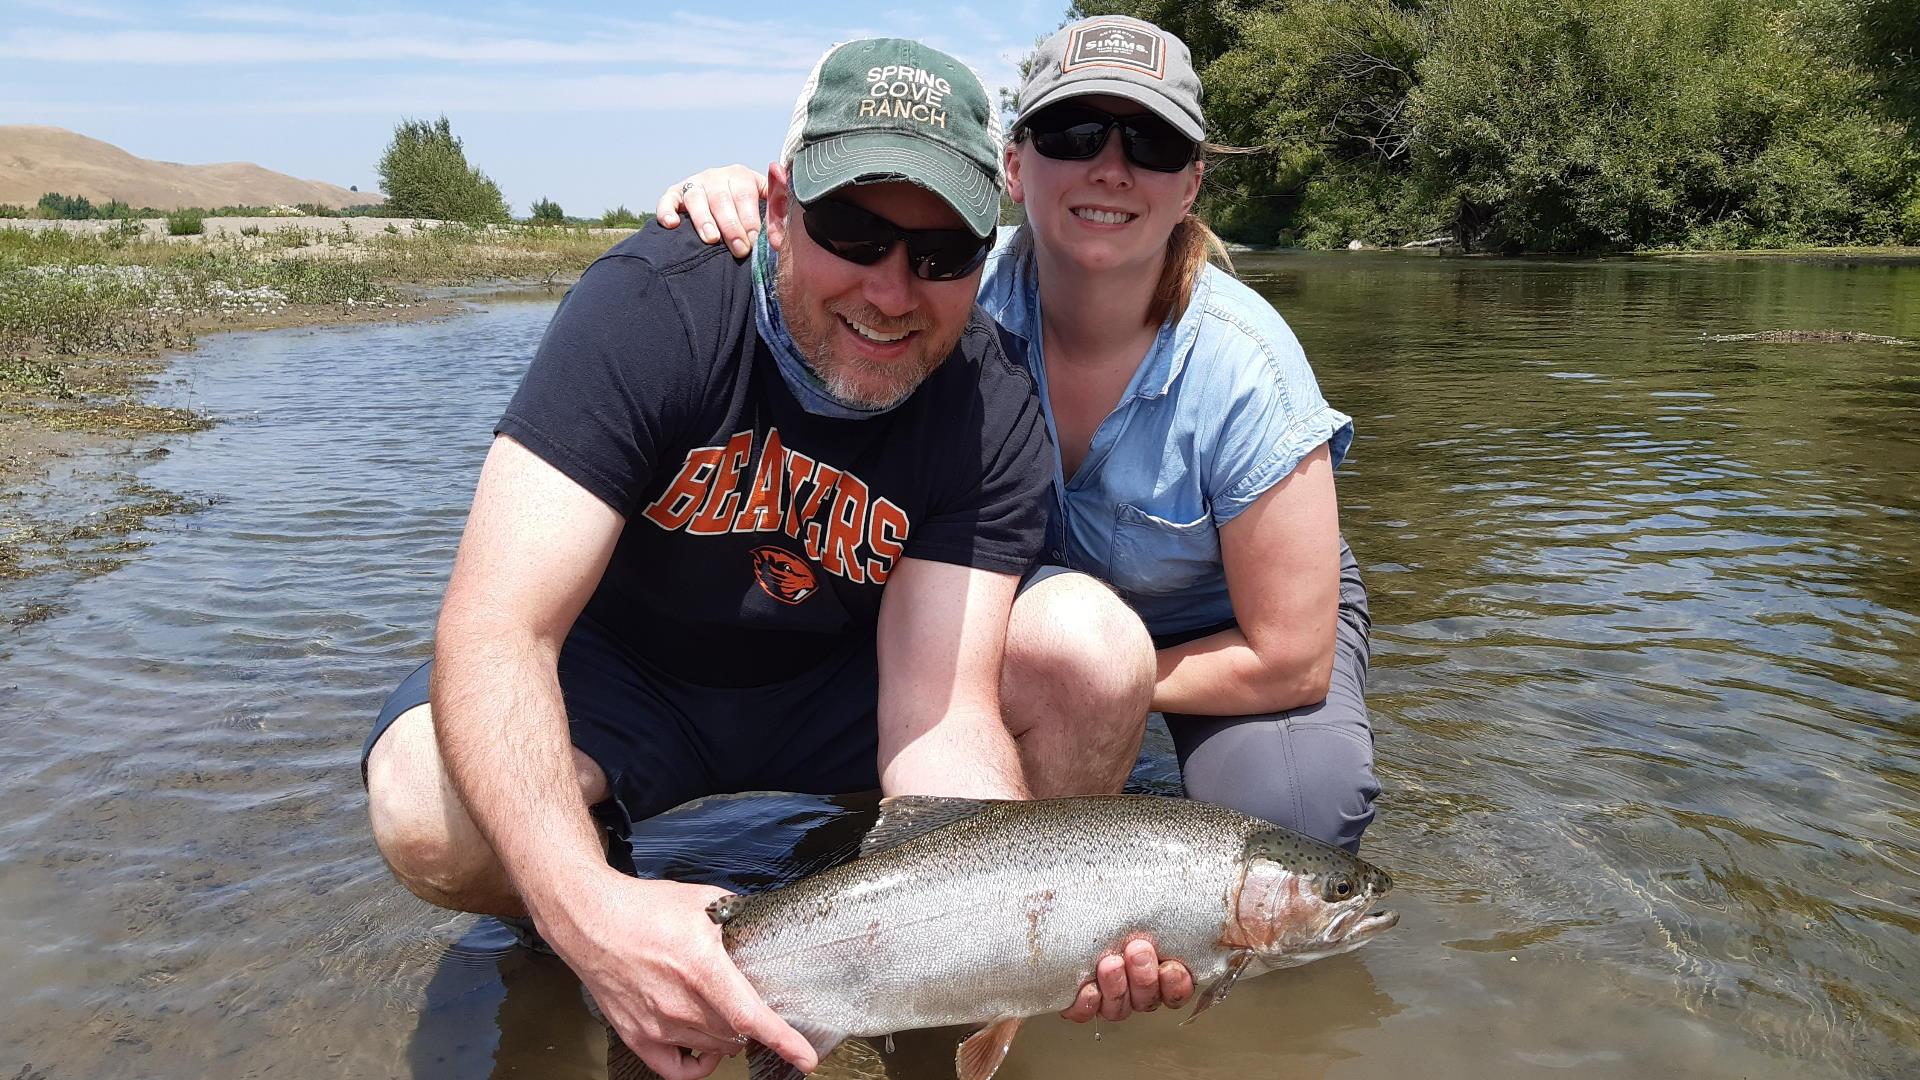 John and McKinzie with Tukituki River rainbow trout